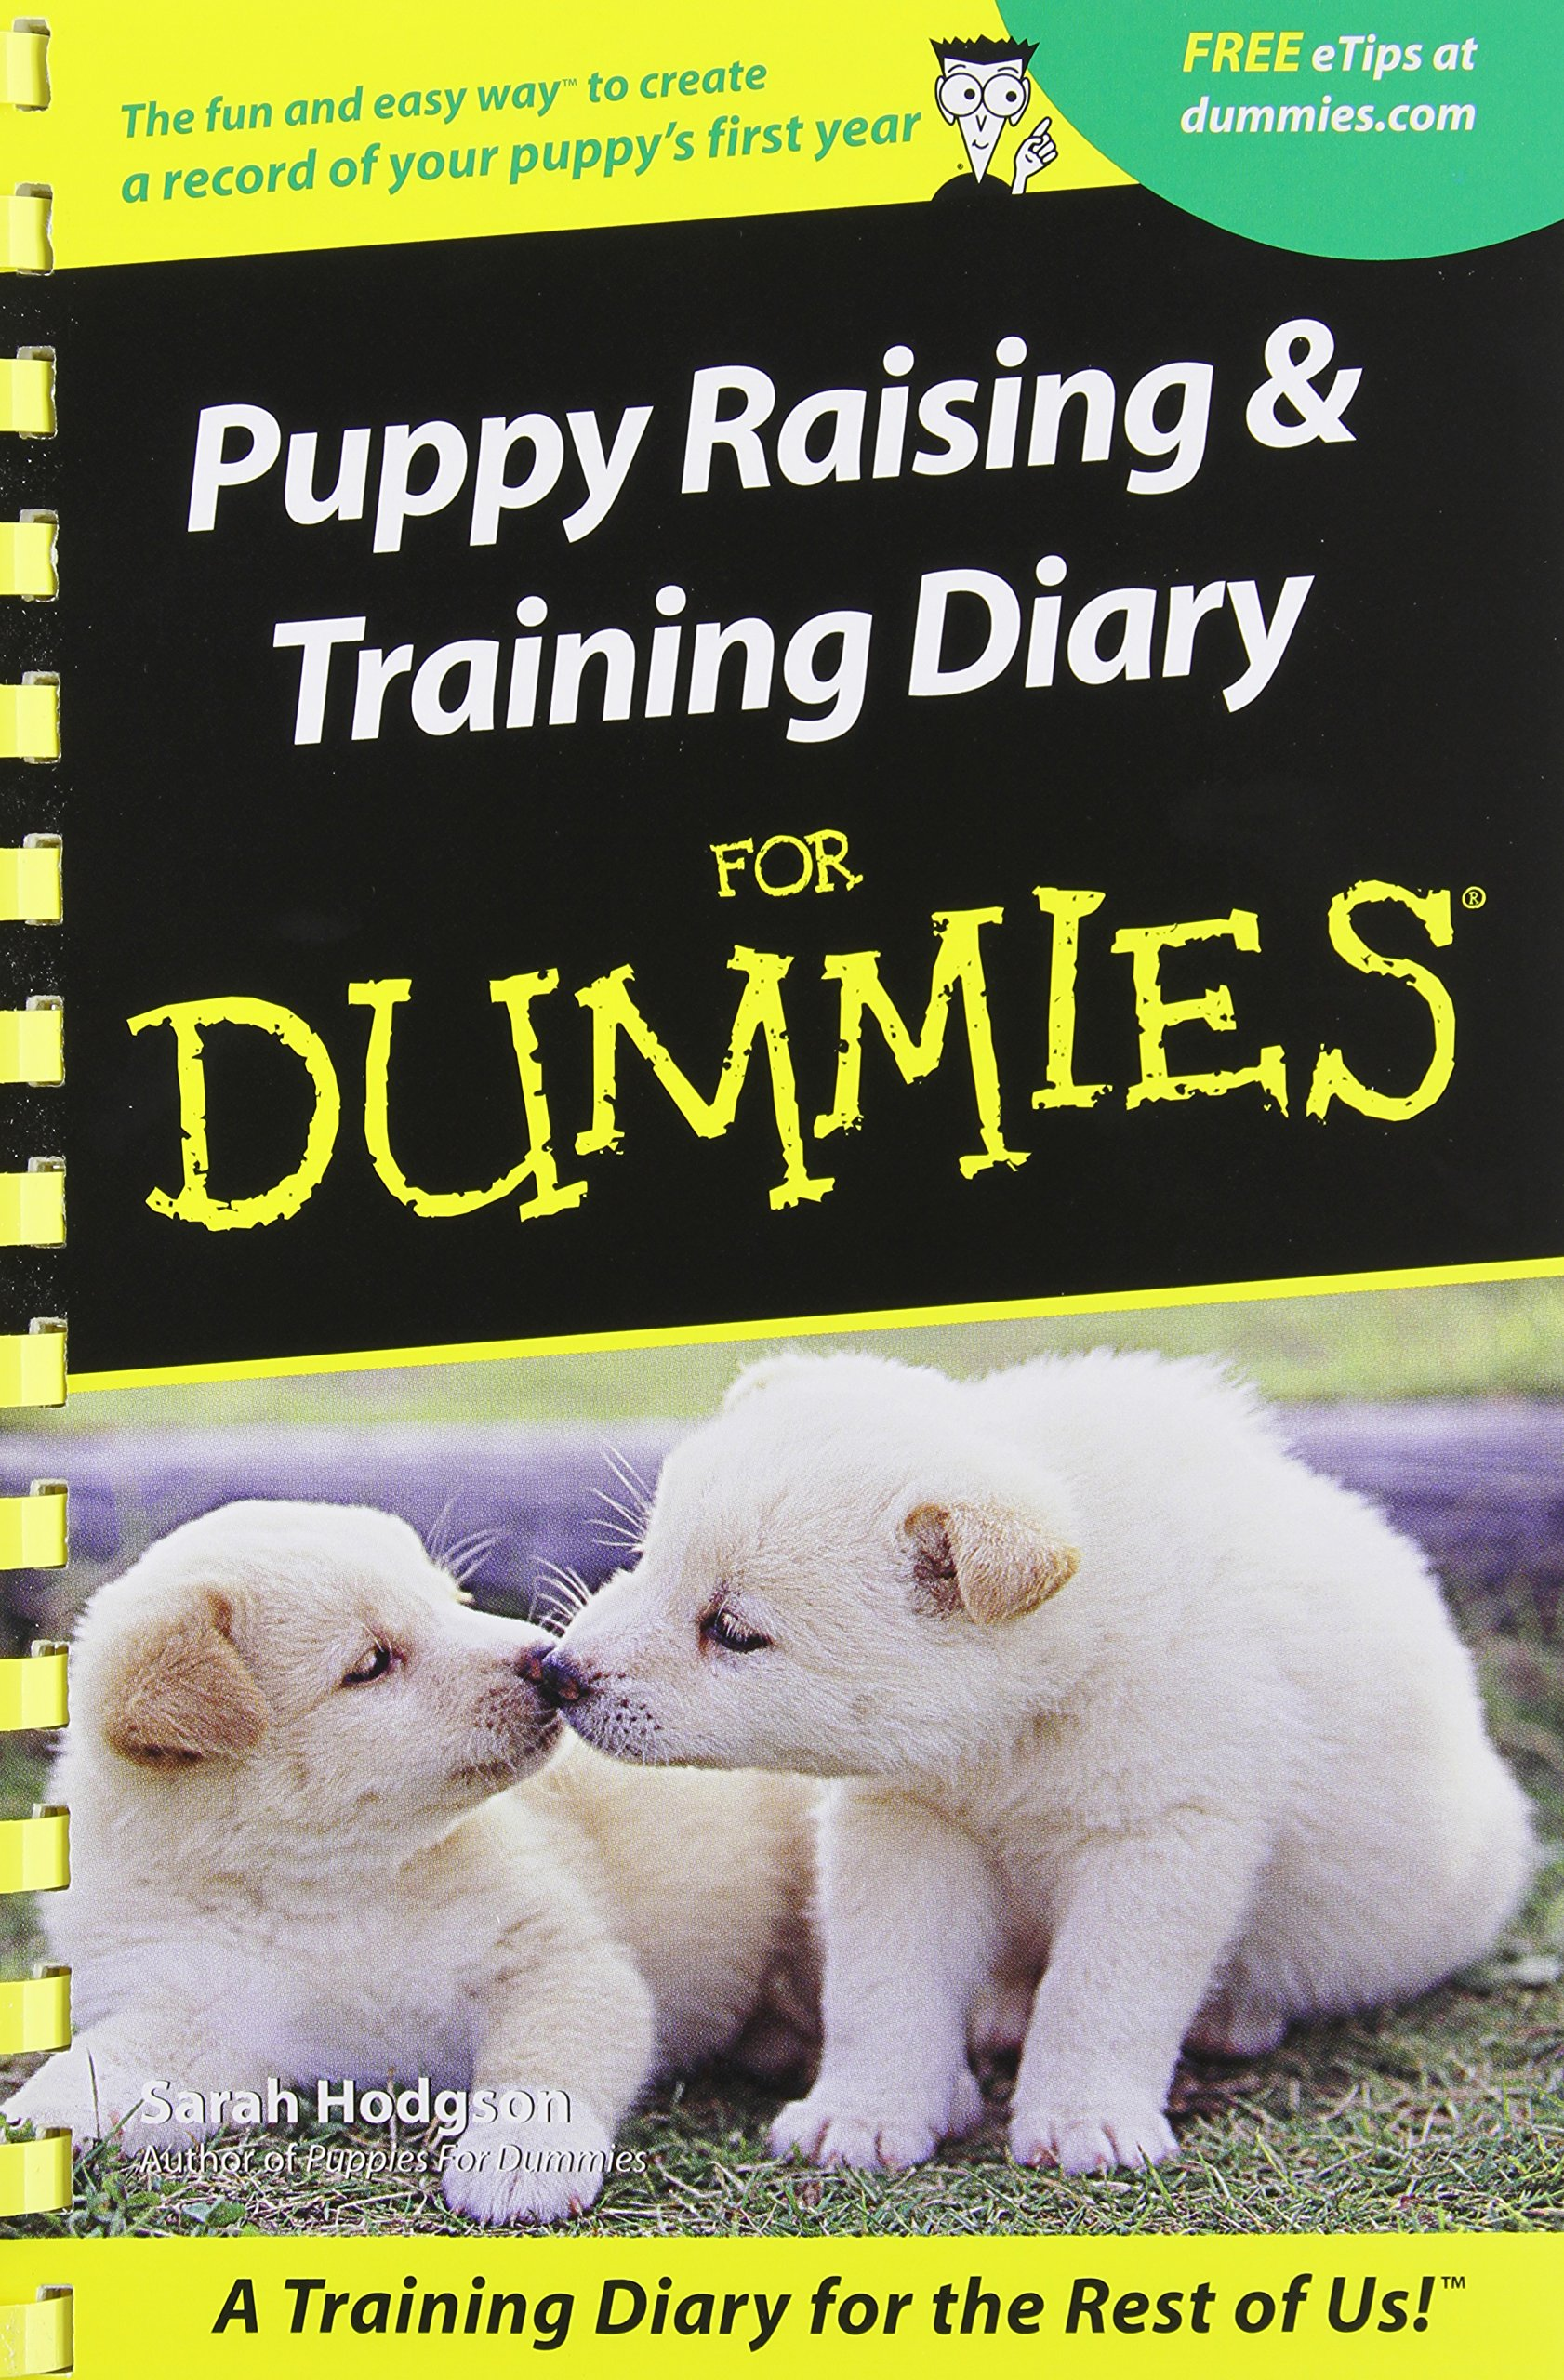 Puppy Raising & Training Diary for Dummies ebook